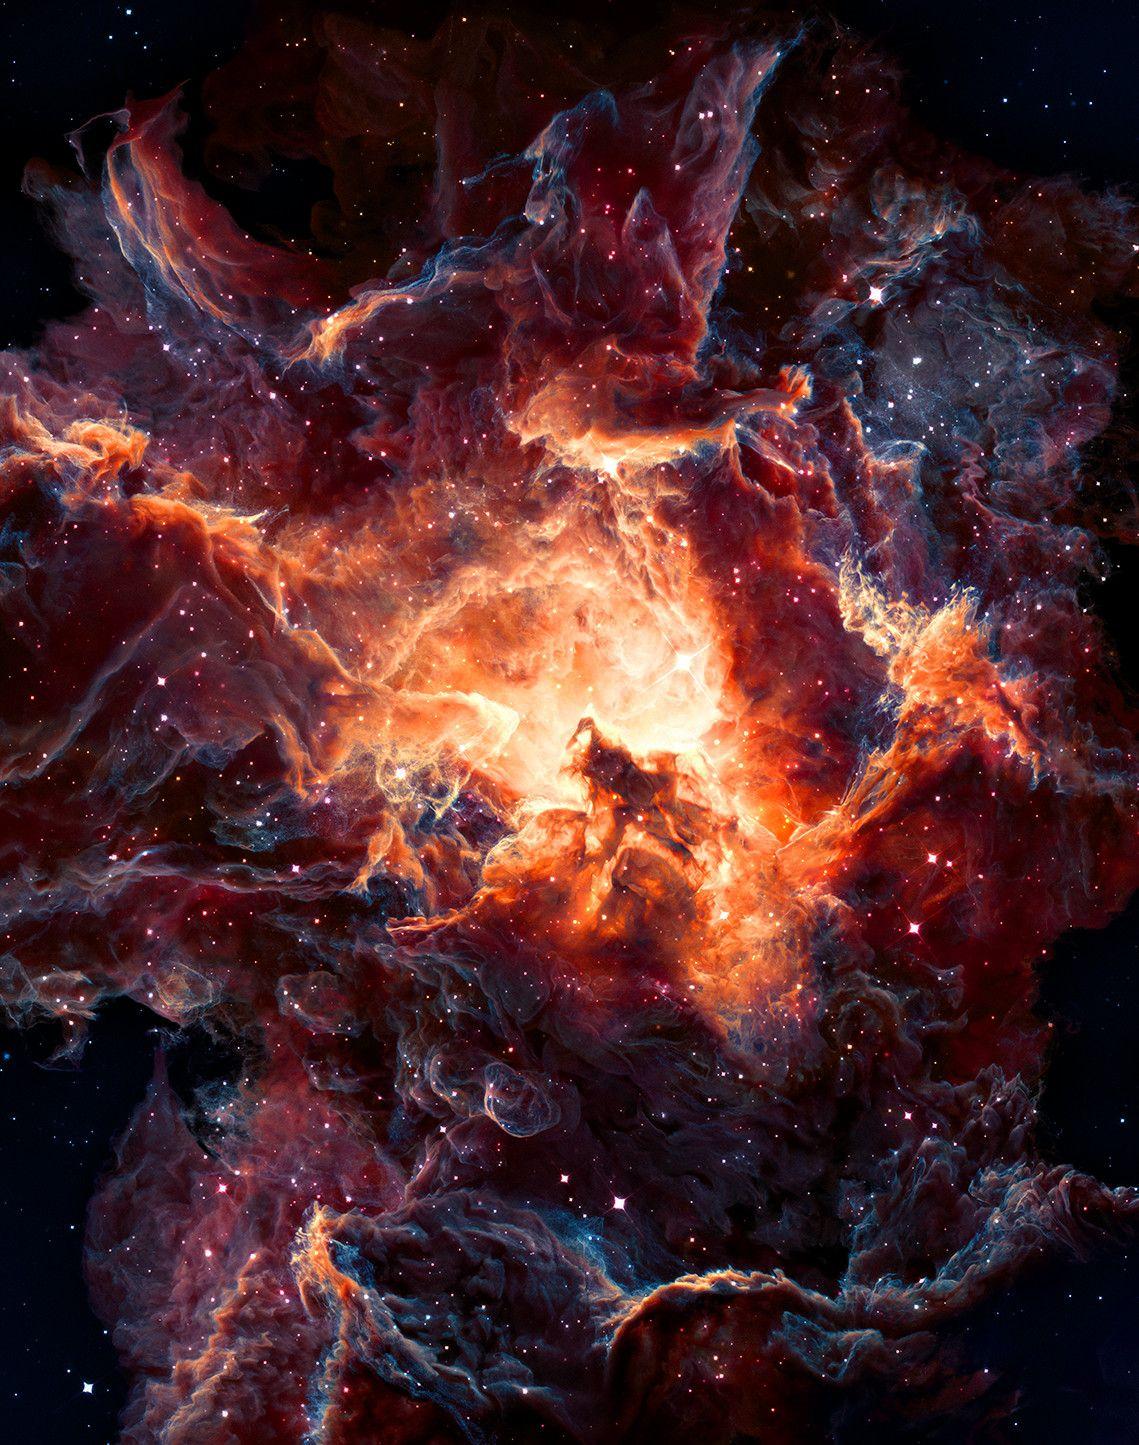 ArtStation - NCC 009.04, Teun van der Zalm | Space ...